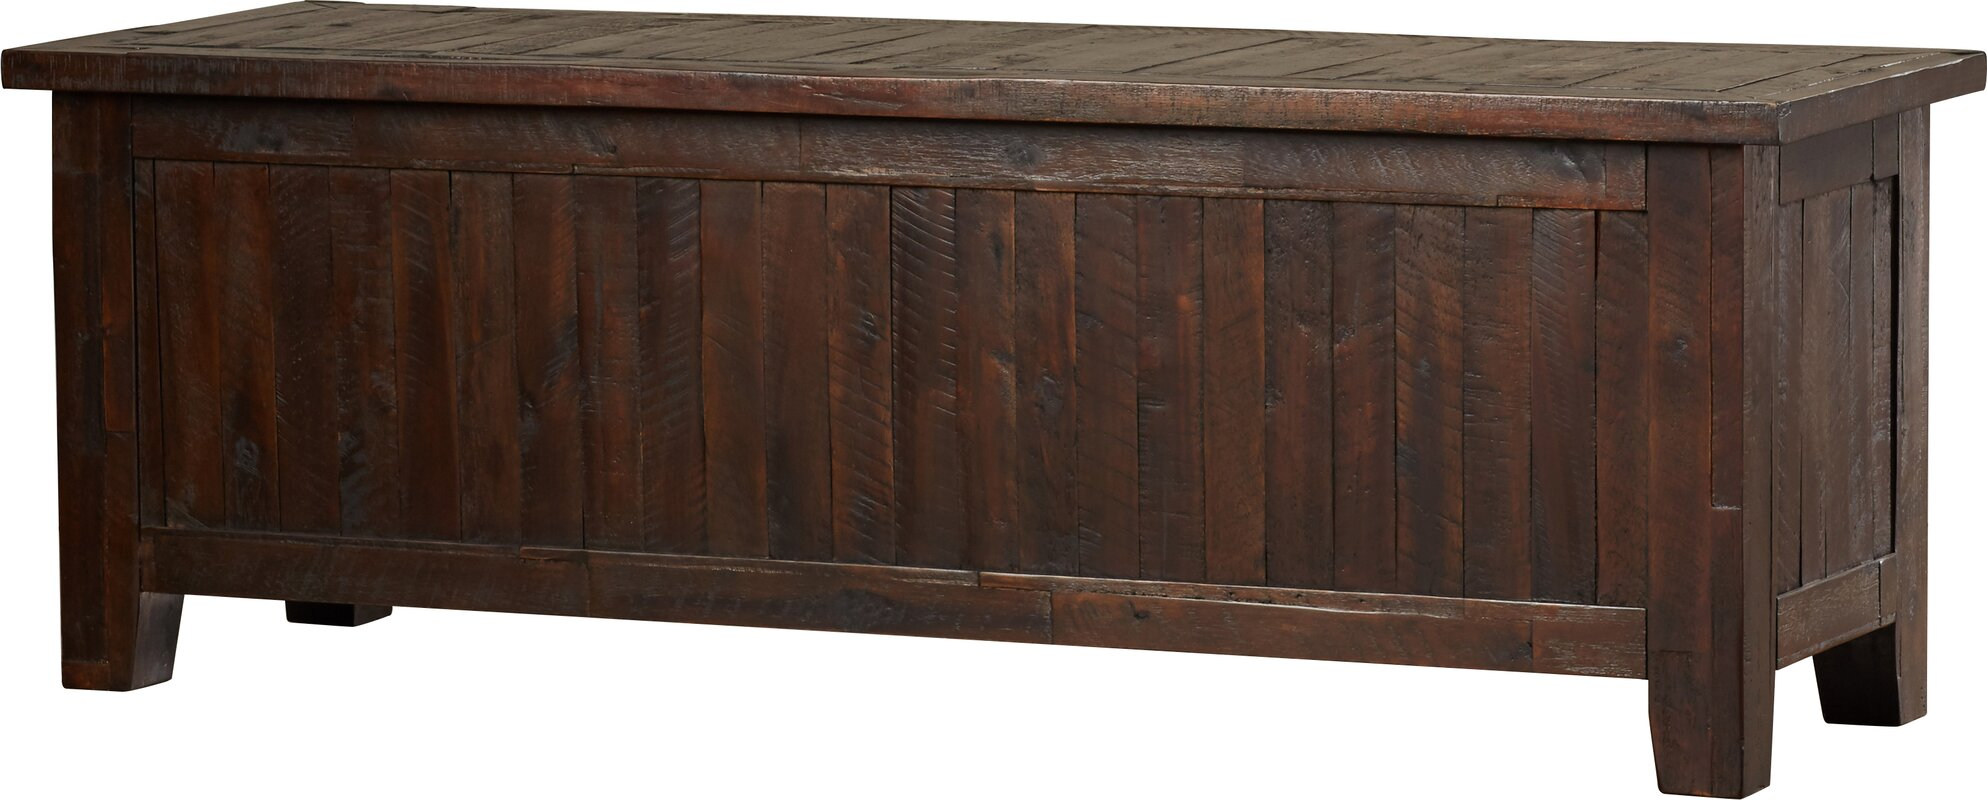 Blackhawk Wood Storage Chest